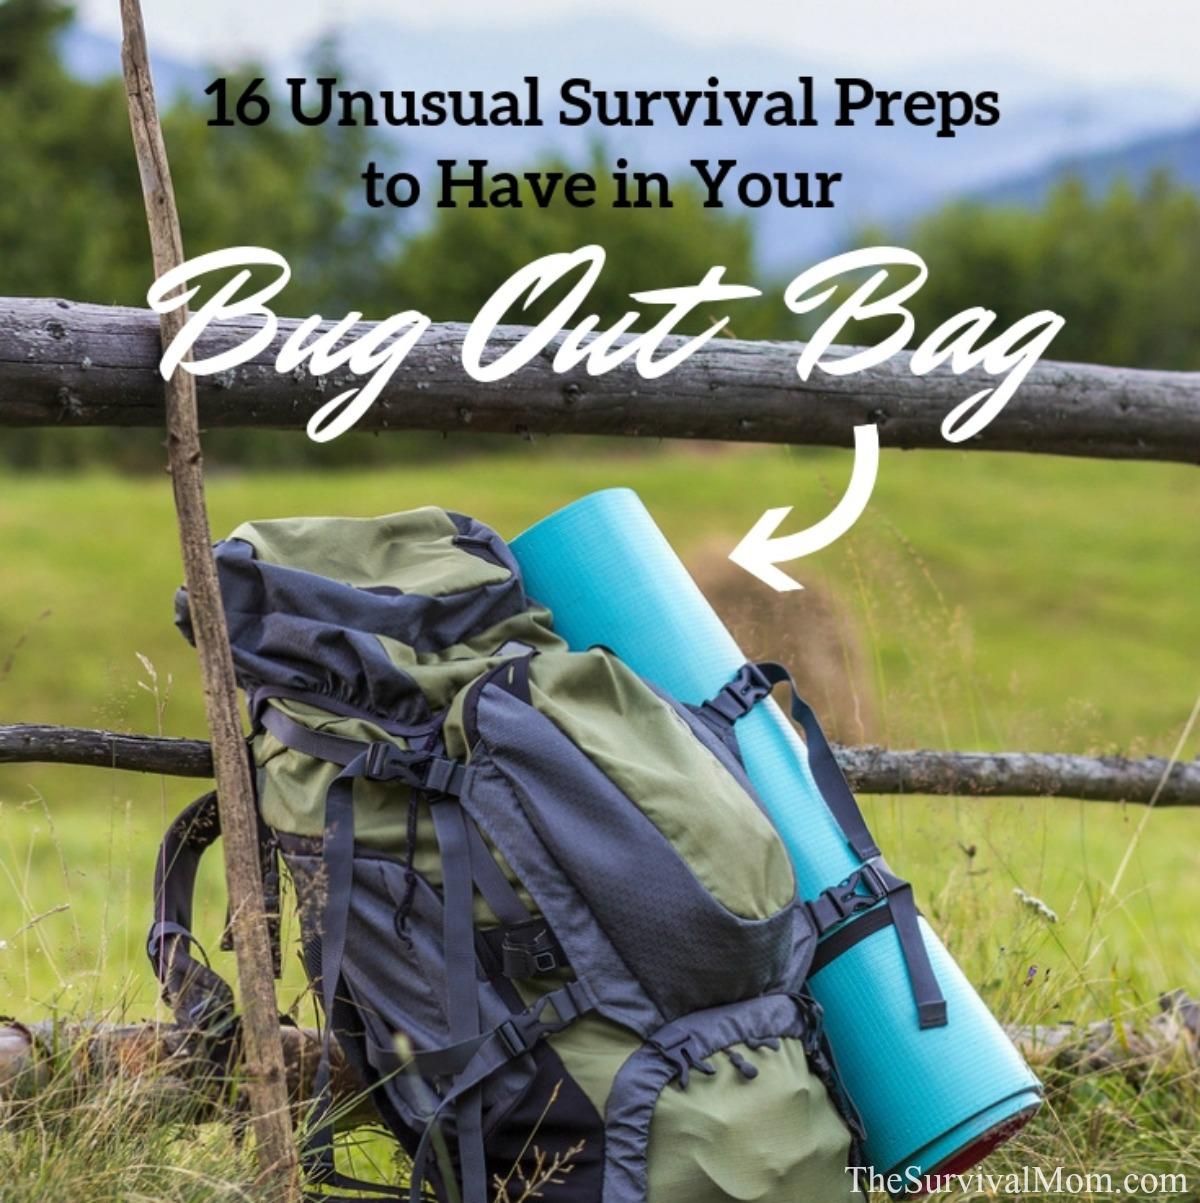 bug out bag, survival bag, survival kit, emergency kit, unusual preps,unusual survival preps